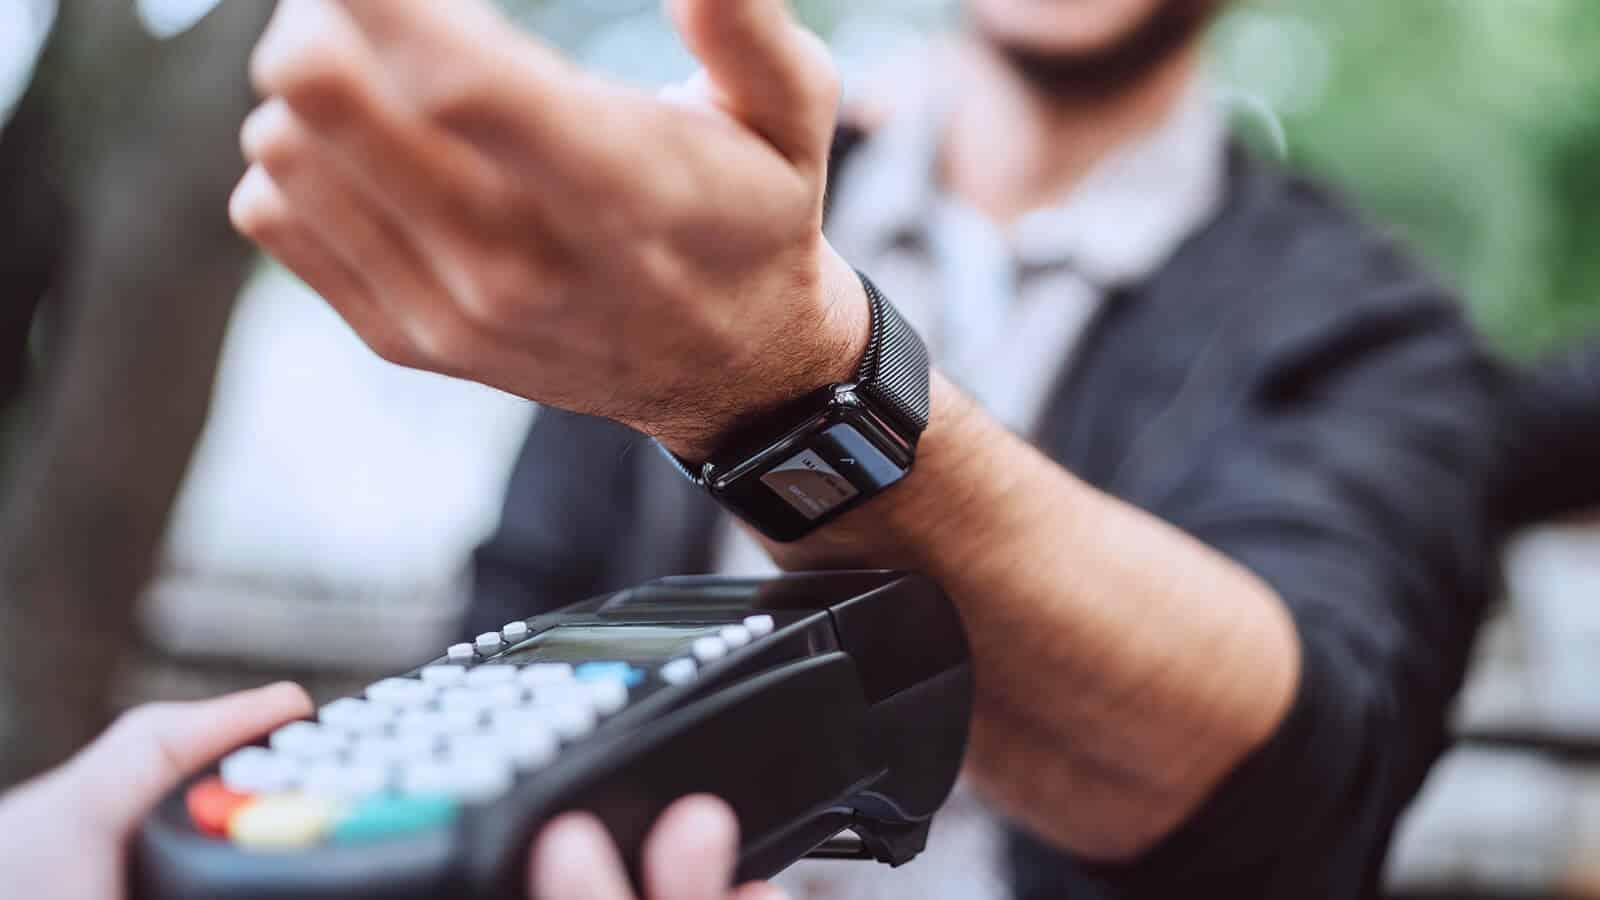 Smartwatch Bezahlvorgang mit Terminal